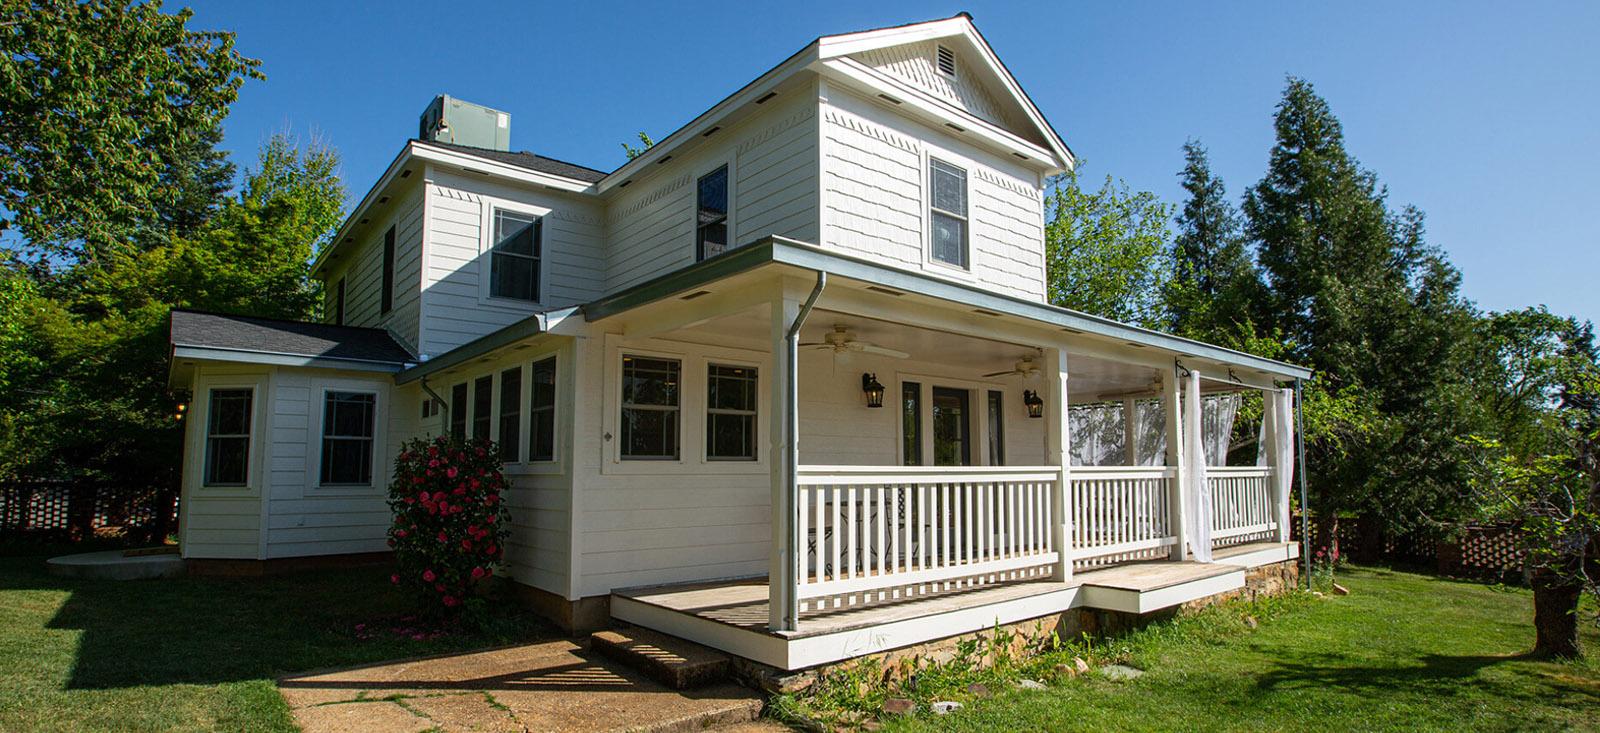 House at Newsome Harlow Murphys California